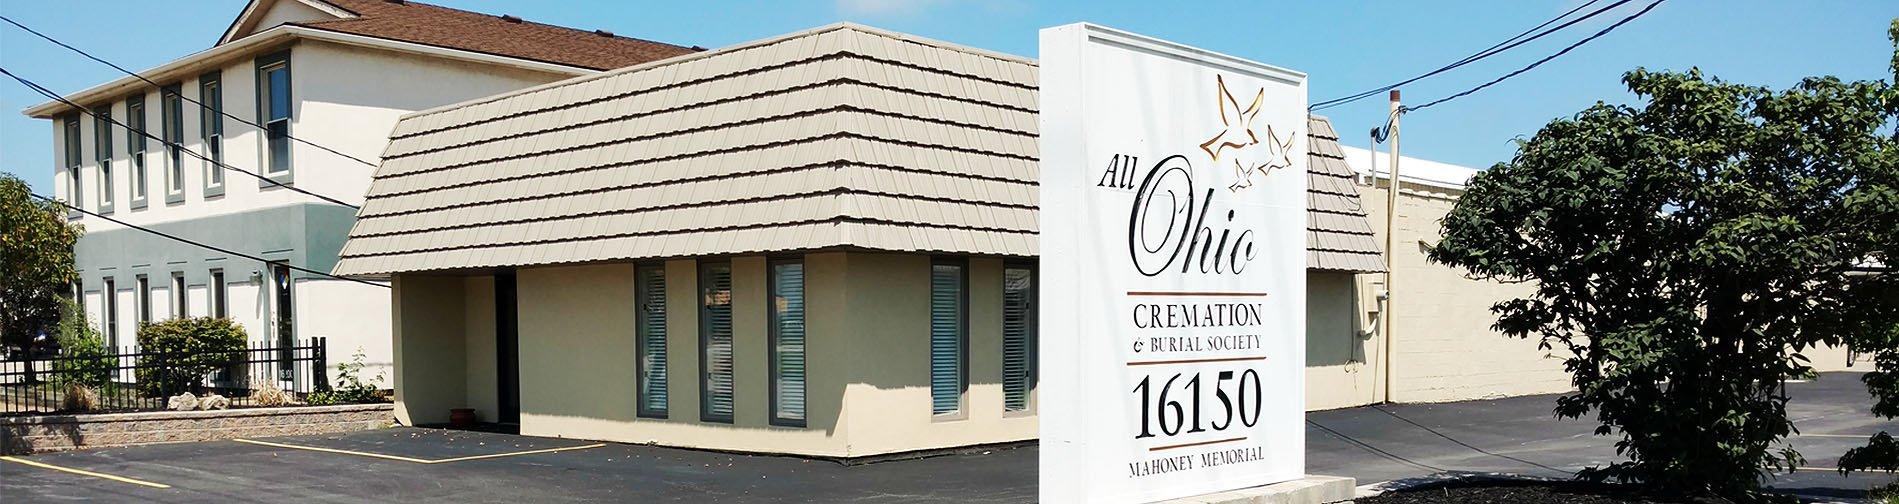 Captain James O  Hix III, D D S  — All Ohio Cremation